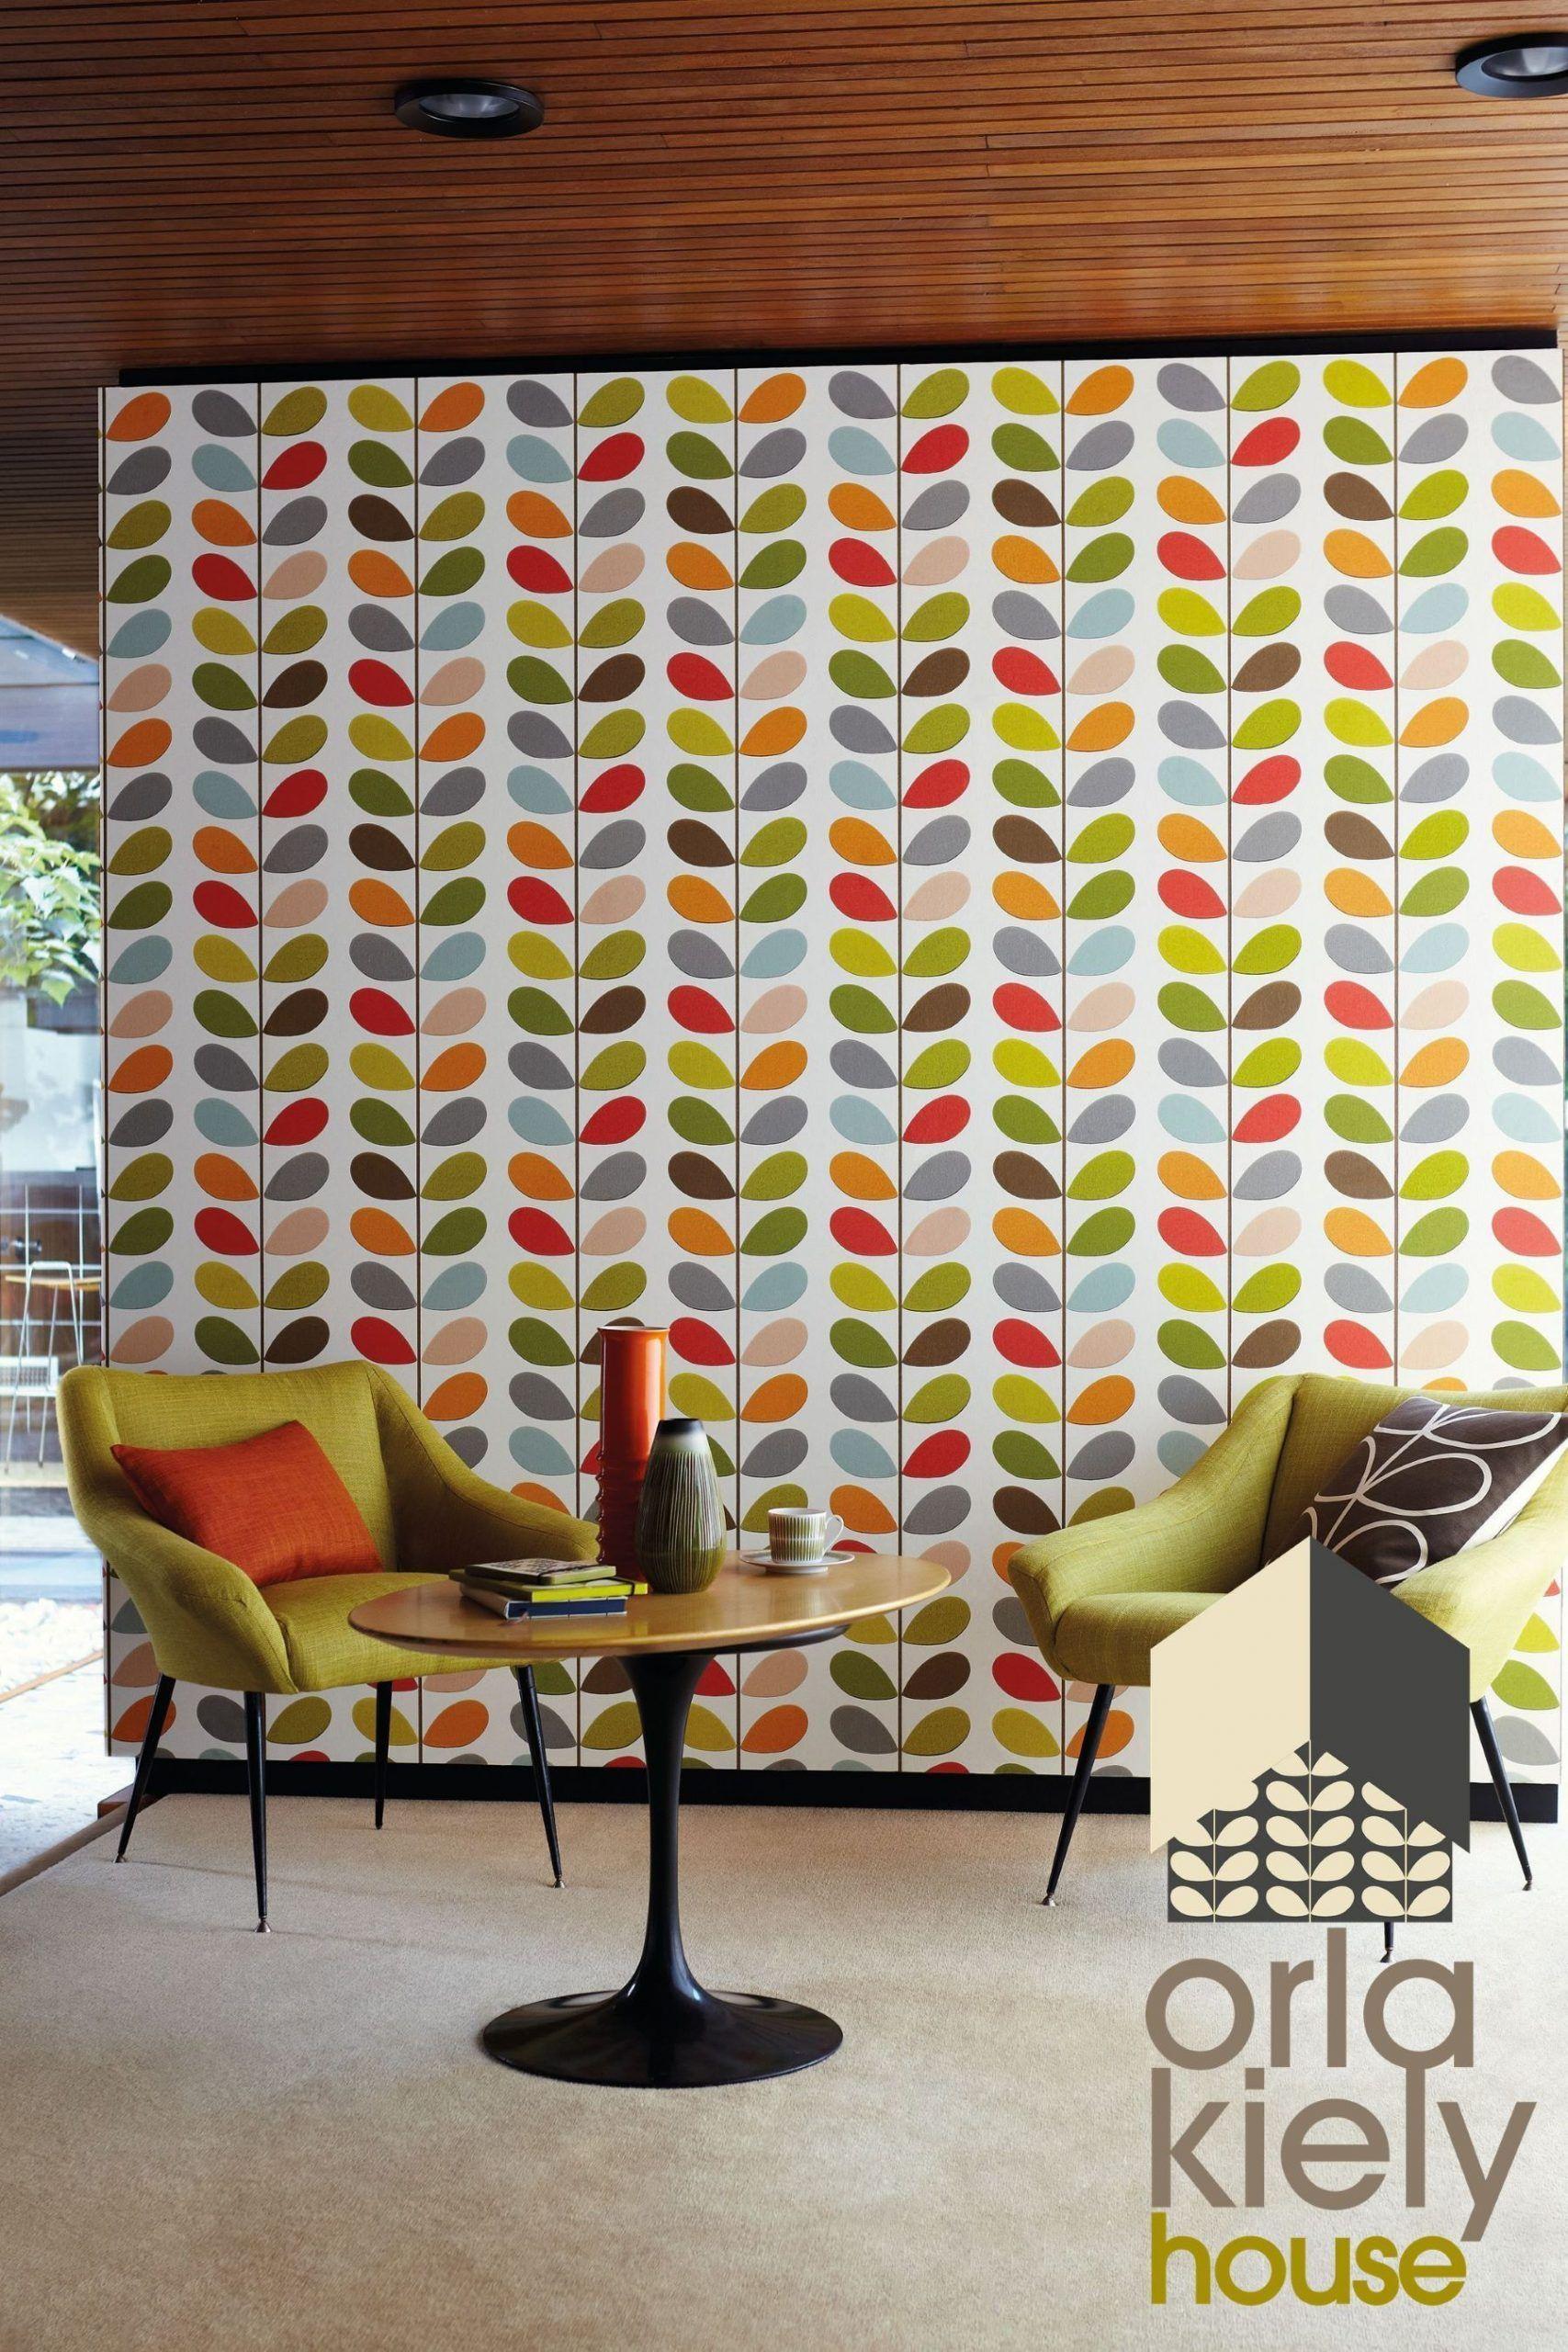 Kaufen Sie Orla Kiely Original Multi Stem Wallpaper im